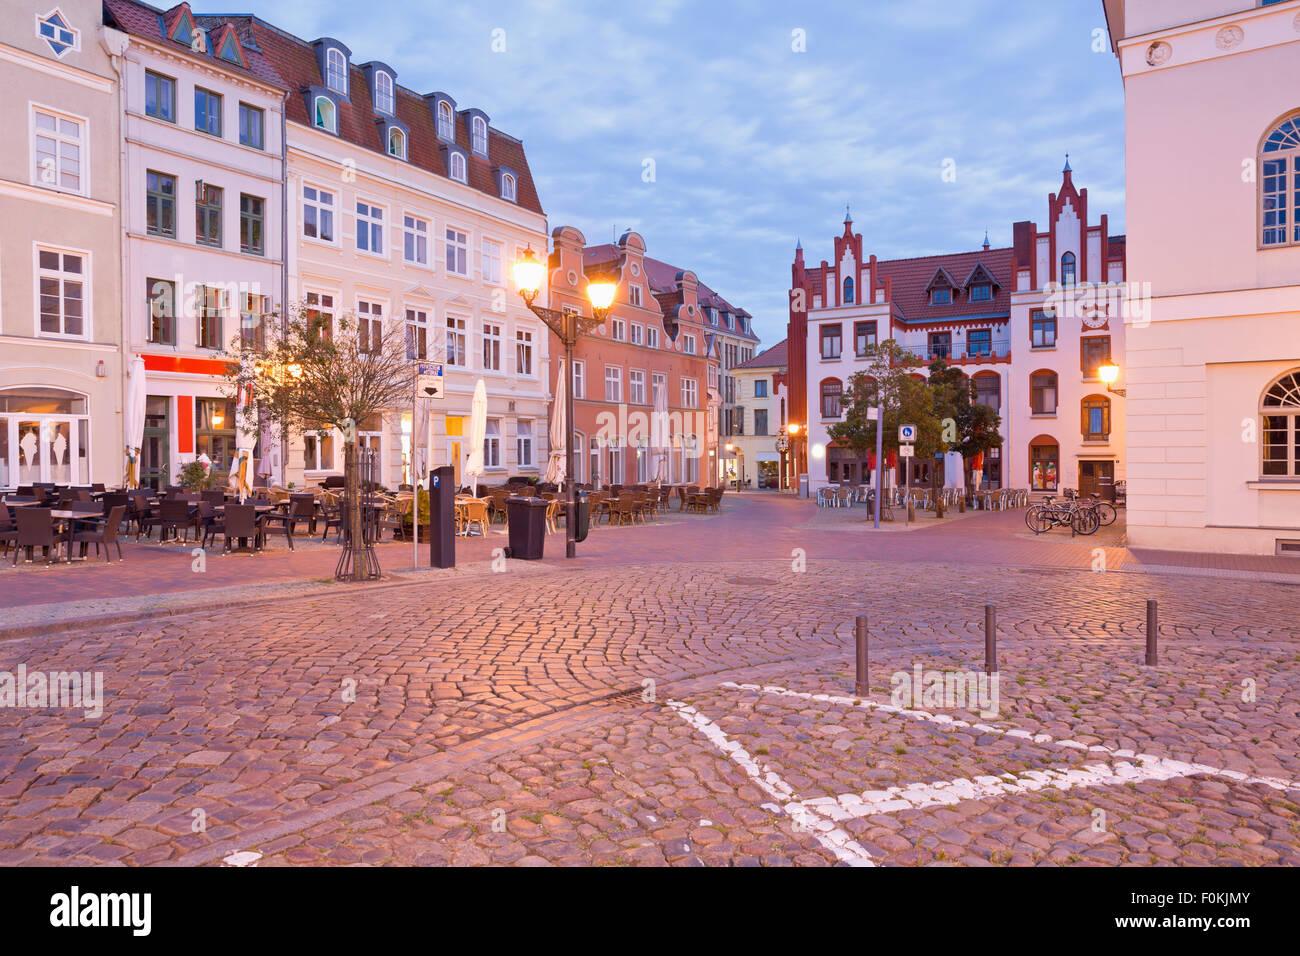 Germany, Wismar, market square at twilight - Stock Image